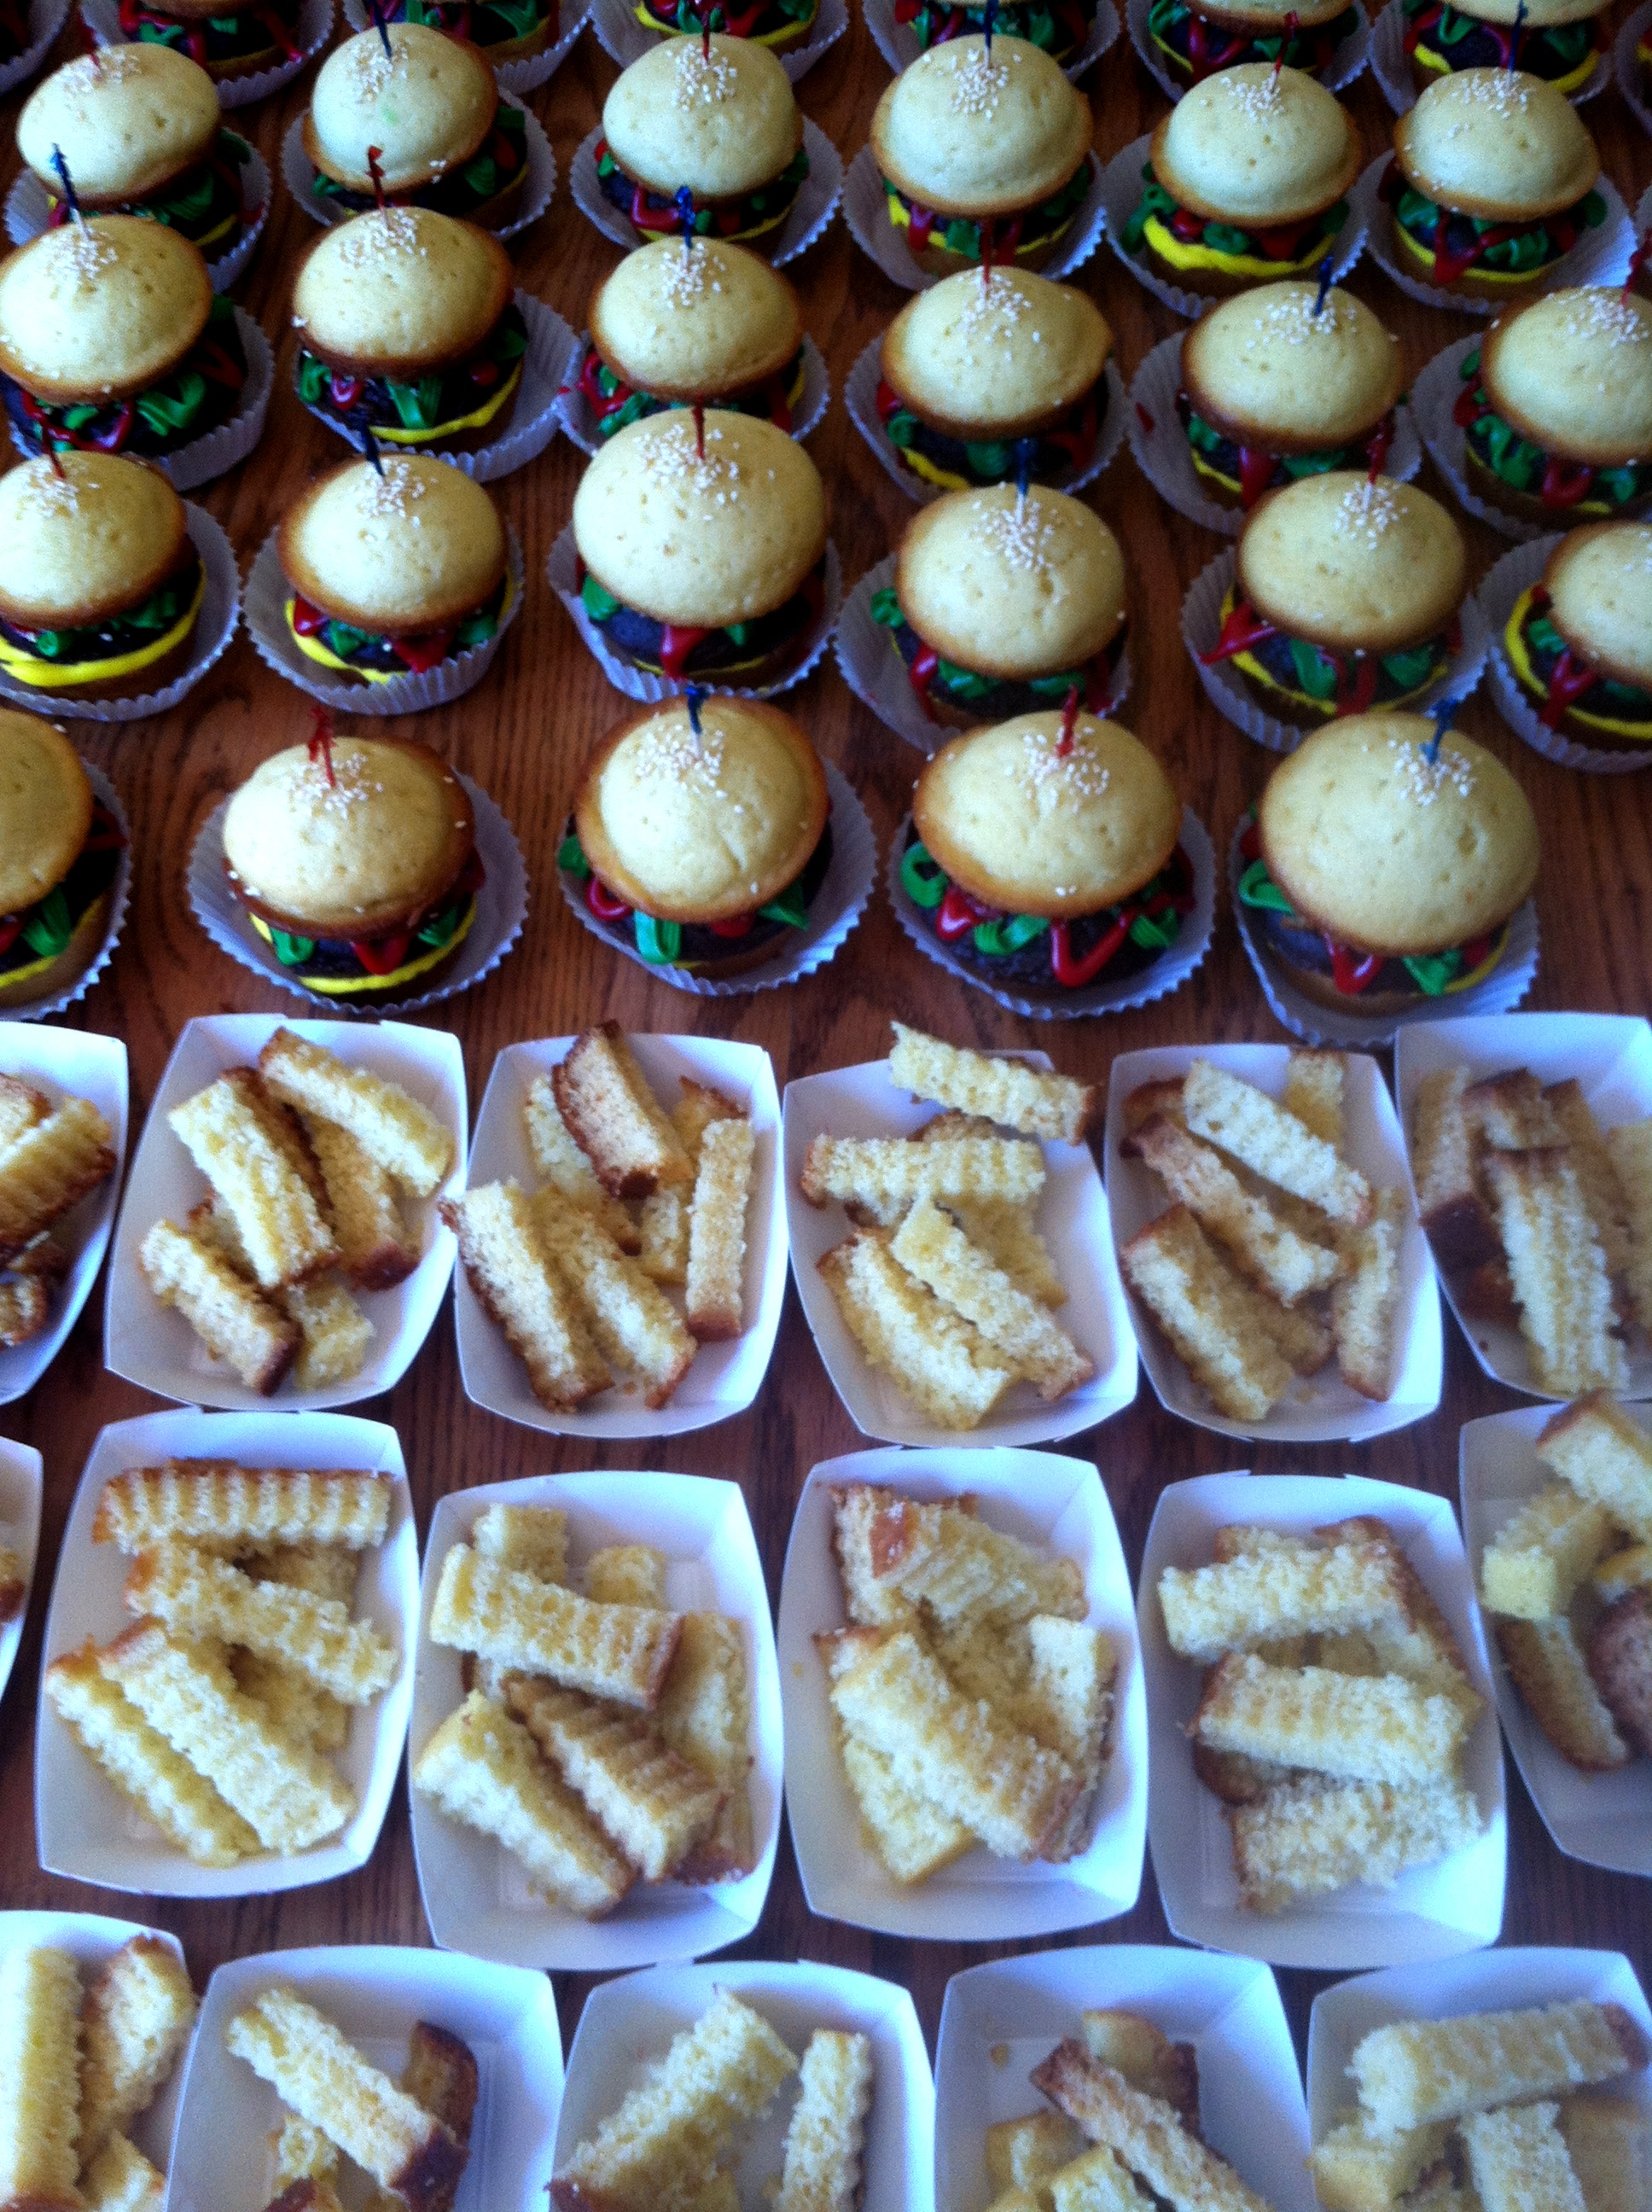 burgersandfries©2013 reality bites cupcakes inc..JPG